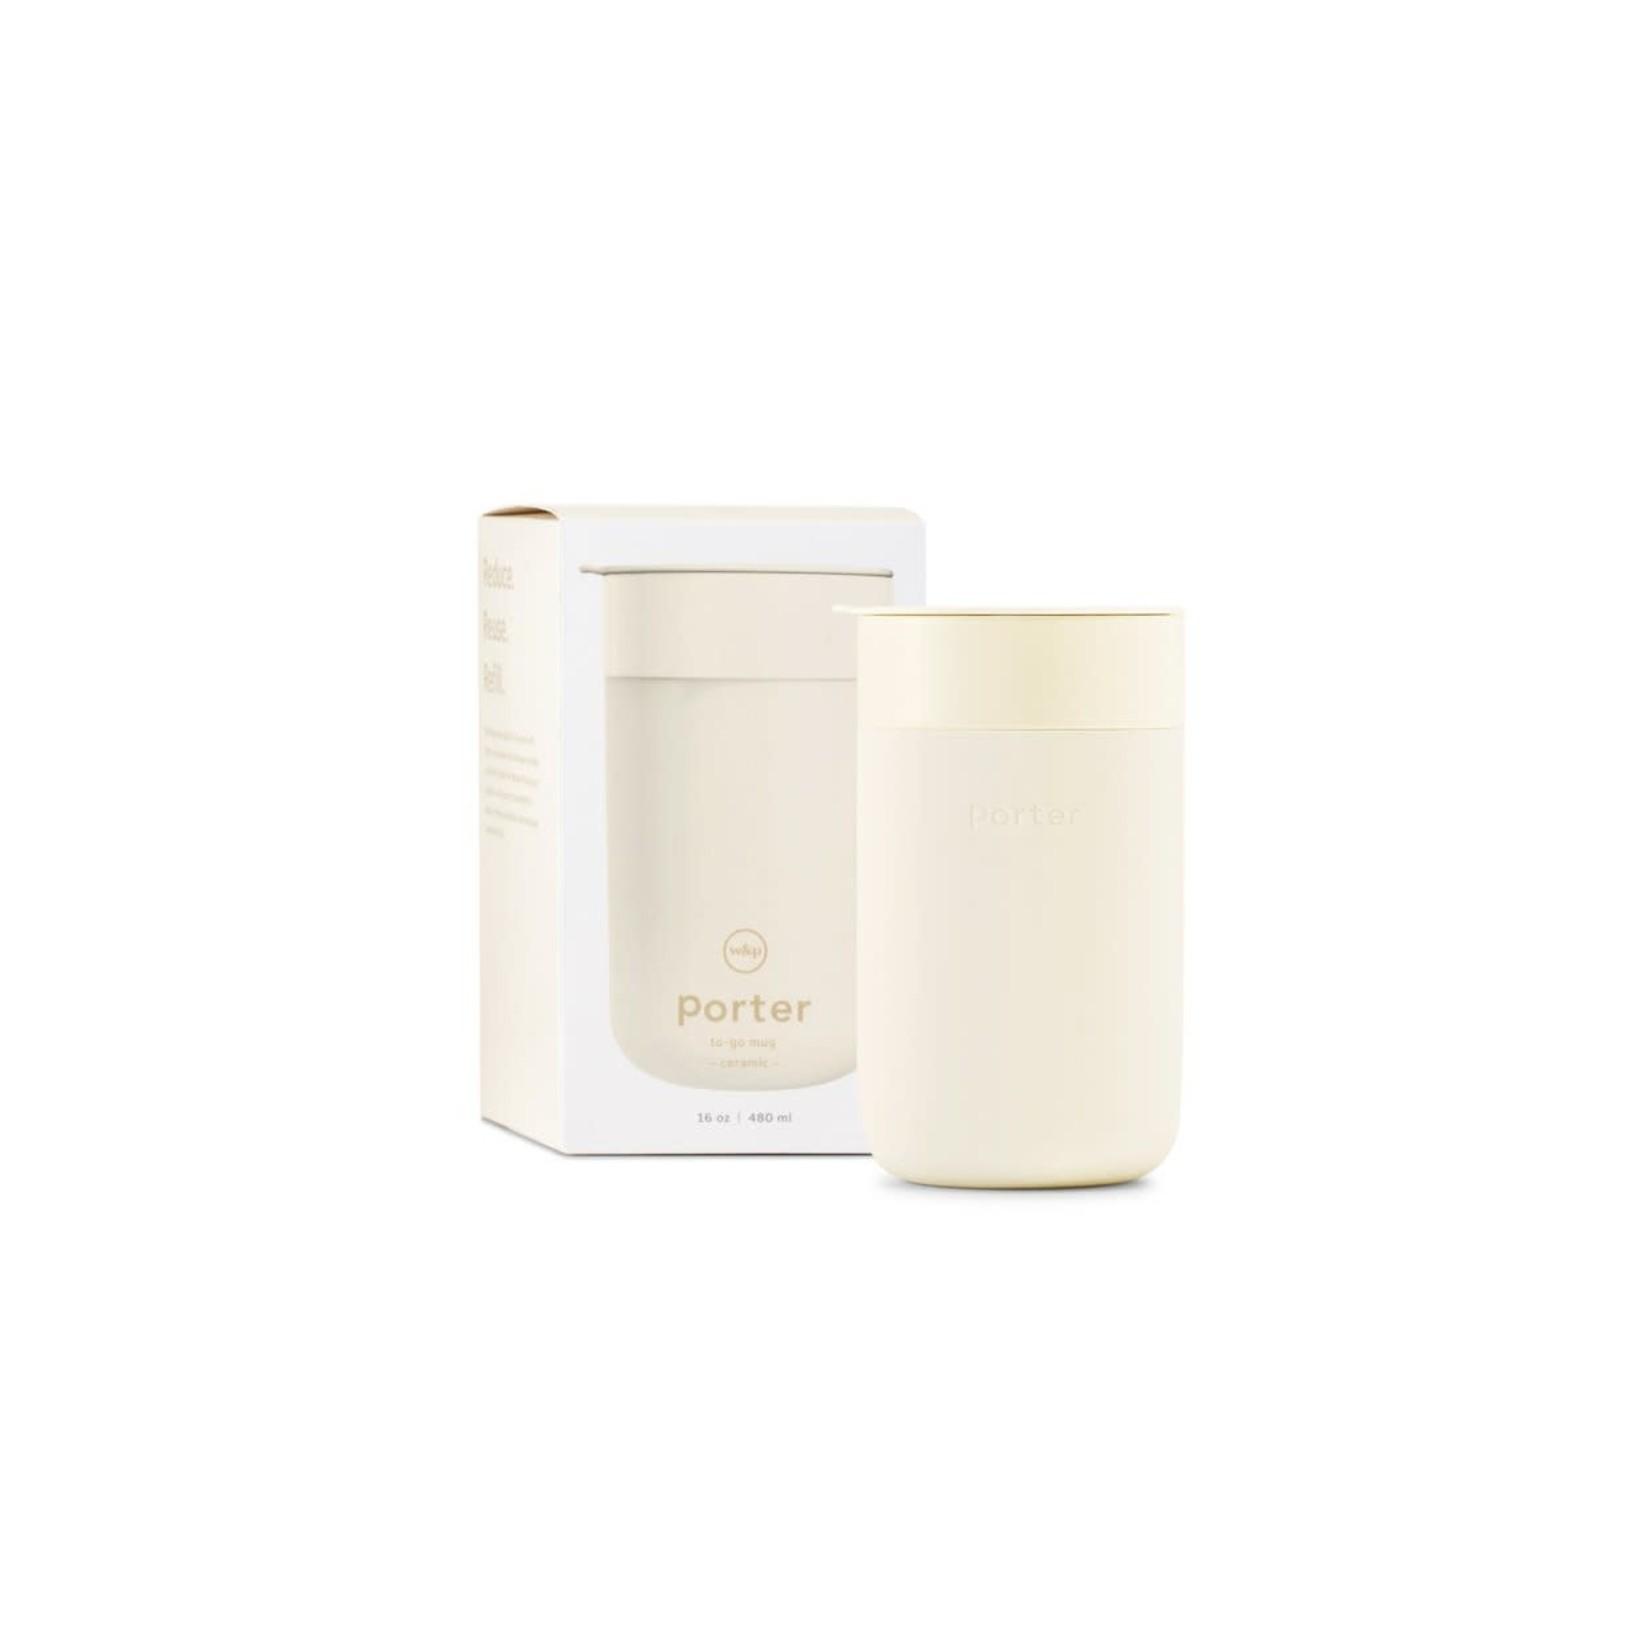 Porter Tasse PORTER 16oz - crème